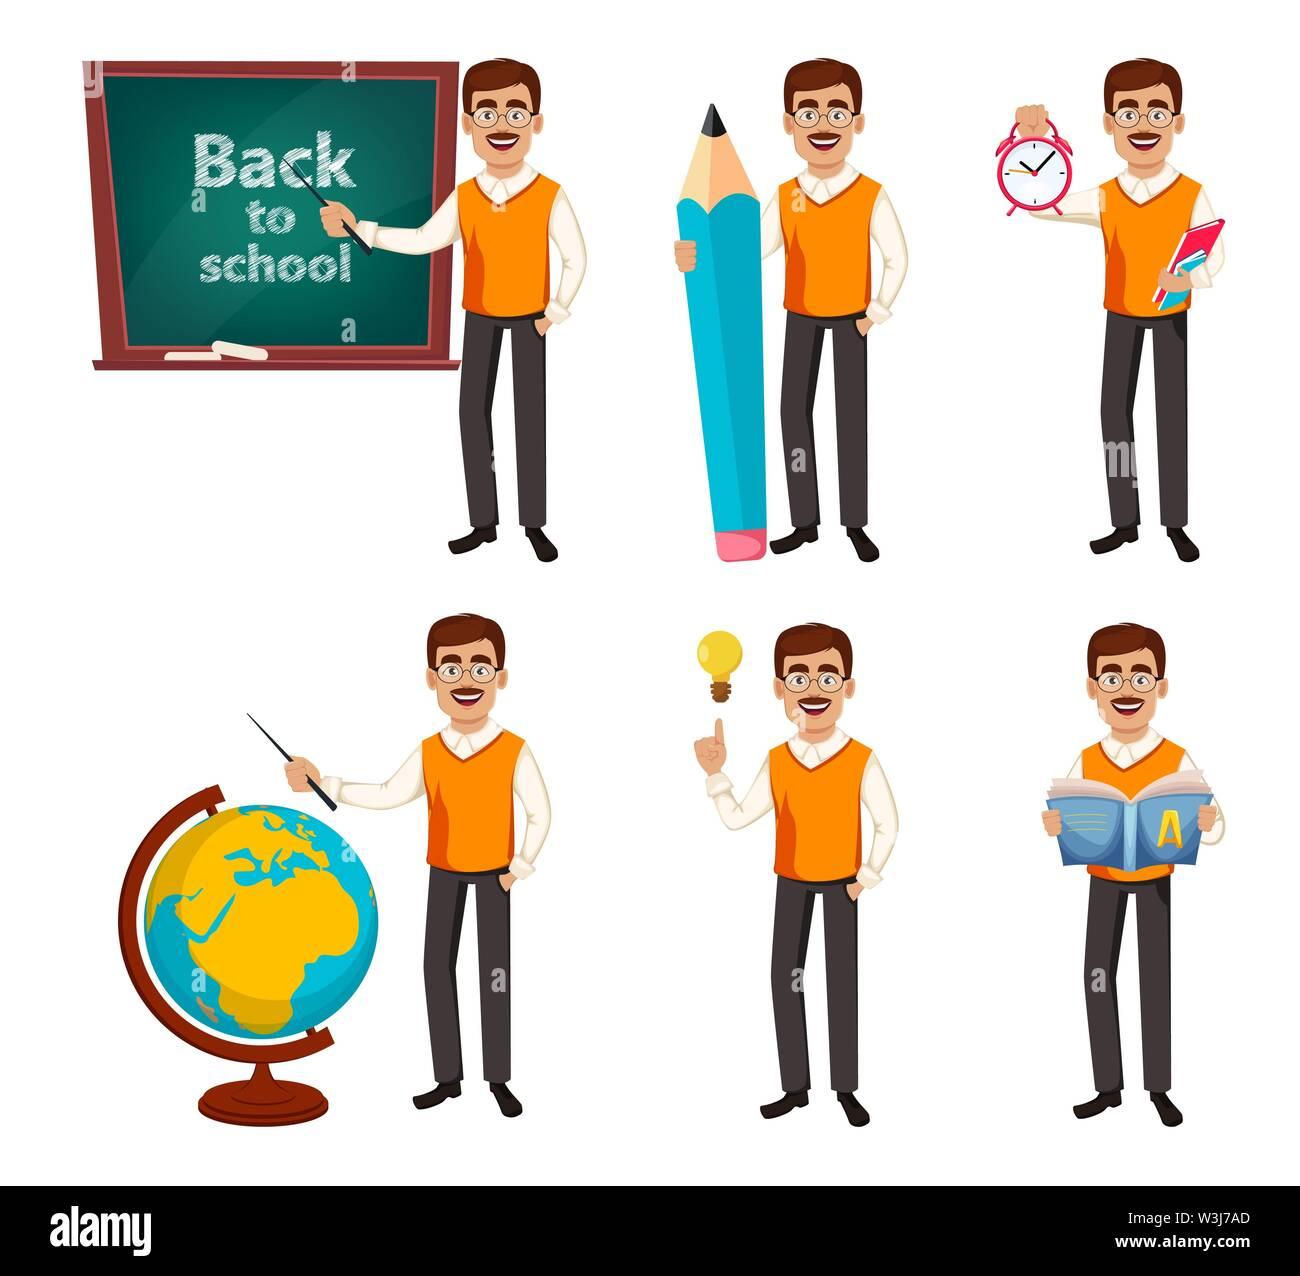 Back to school. Teacher man cartoon character, set of six poses. Teacher's day. Vector illustration - Stock Image